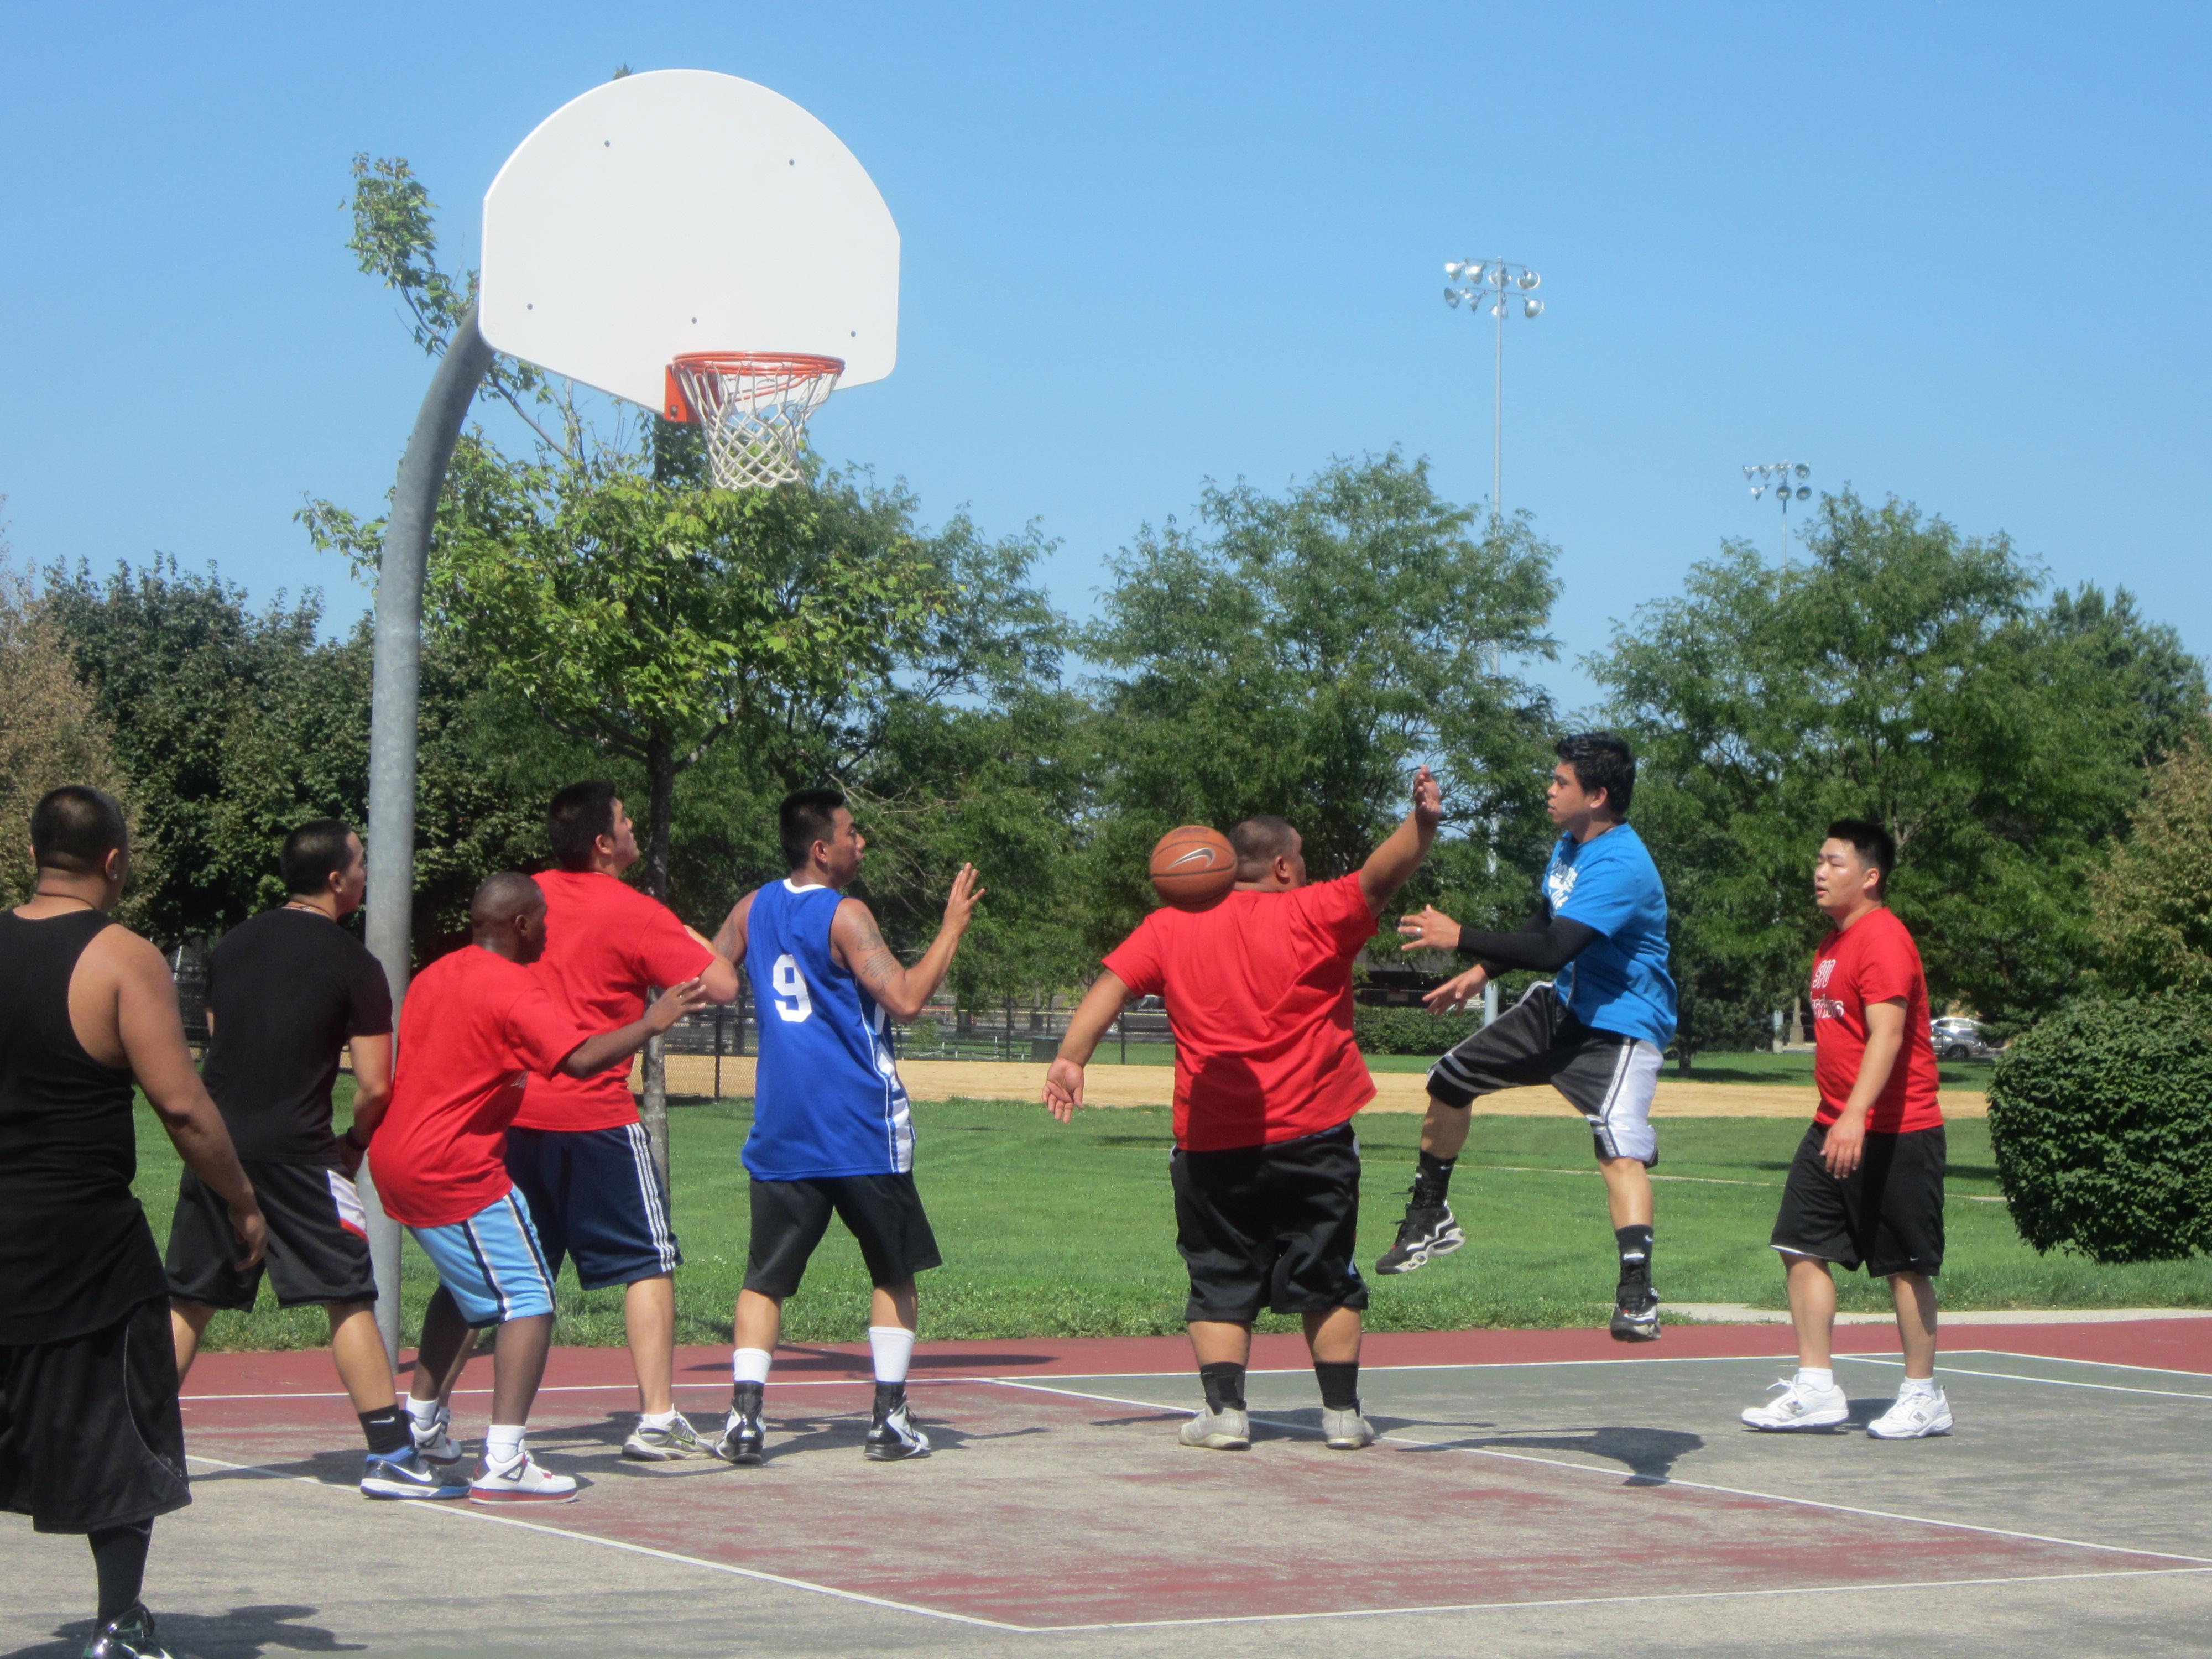 ICI Chicago nursing school sportsfest photo (55).jpg